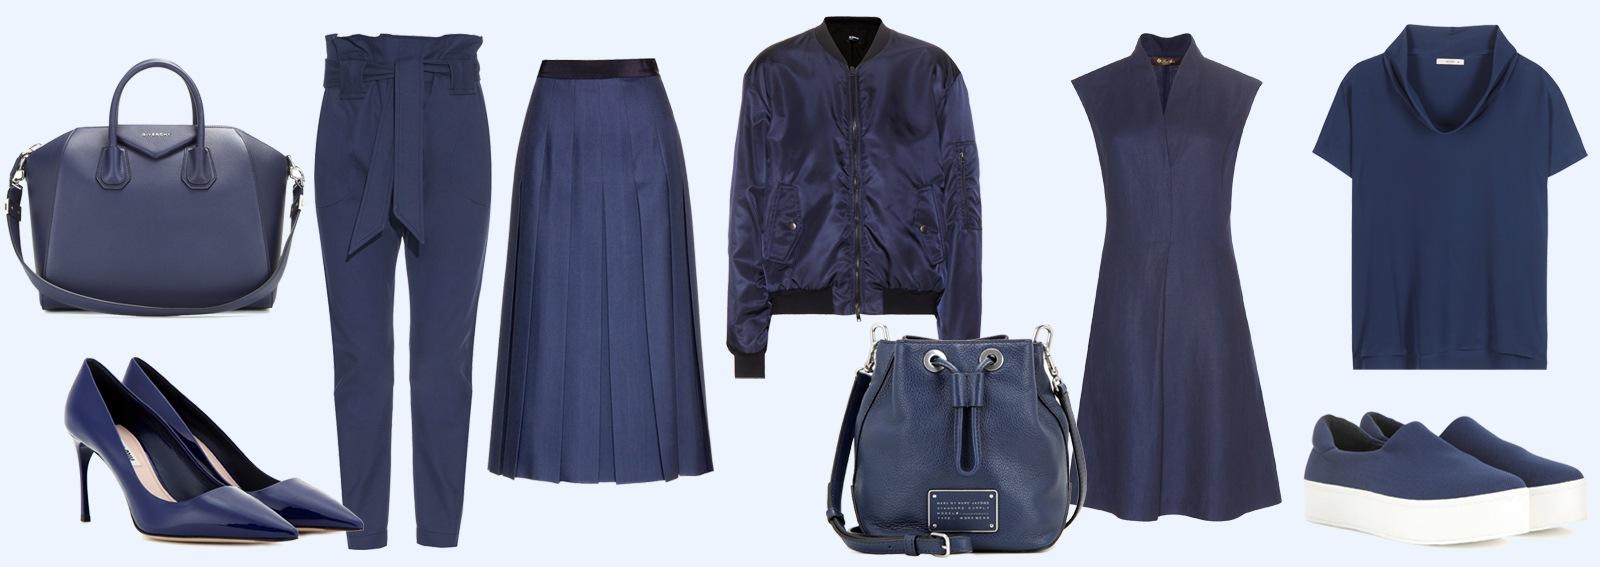 cover tendenza blu navy per la primavera estate dekstop